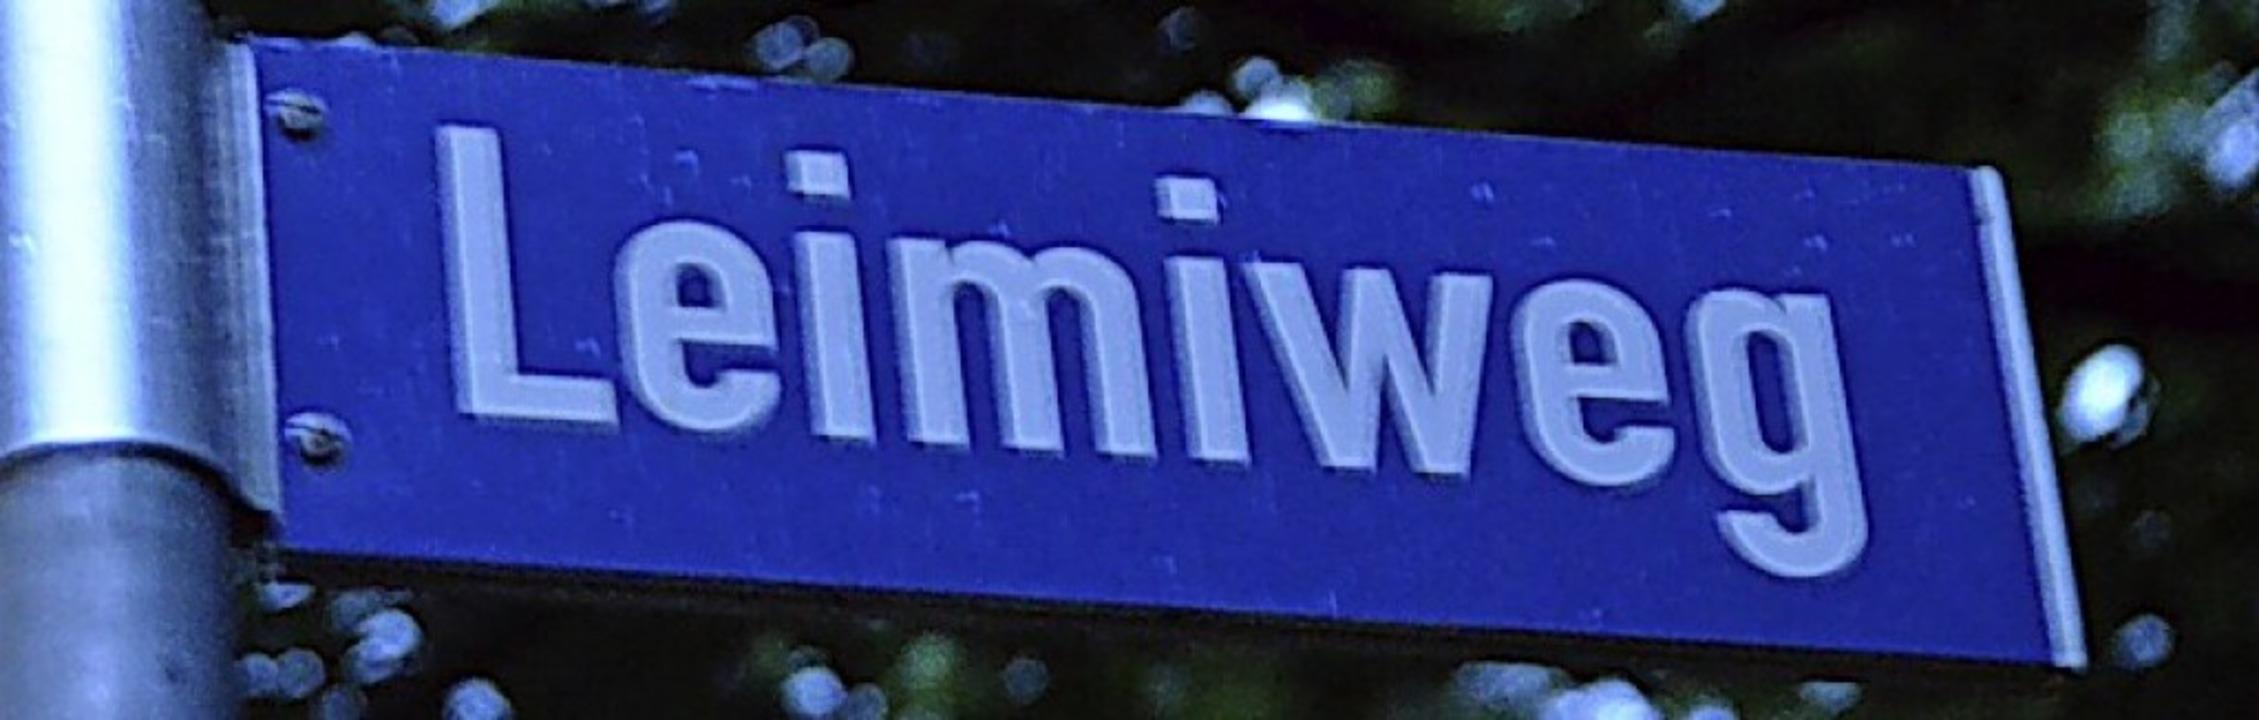 Ewiger Streitpunkt: der Leimiweg    Foto: Tanja Bury